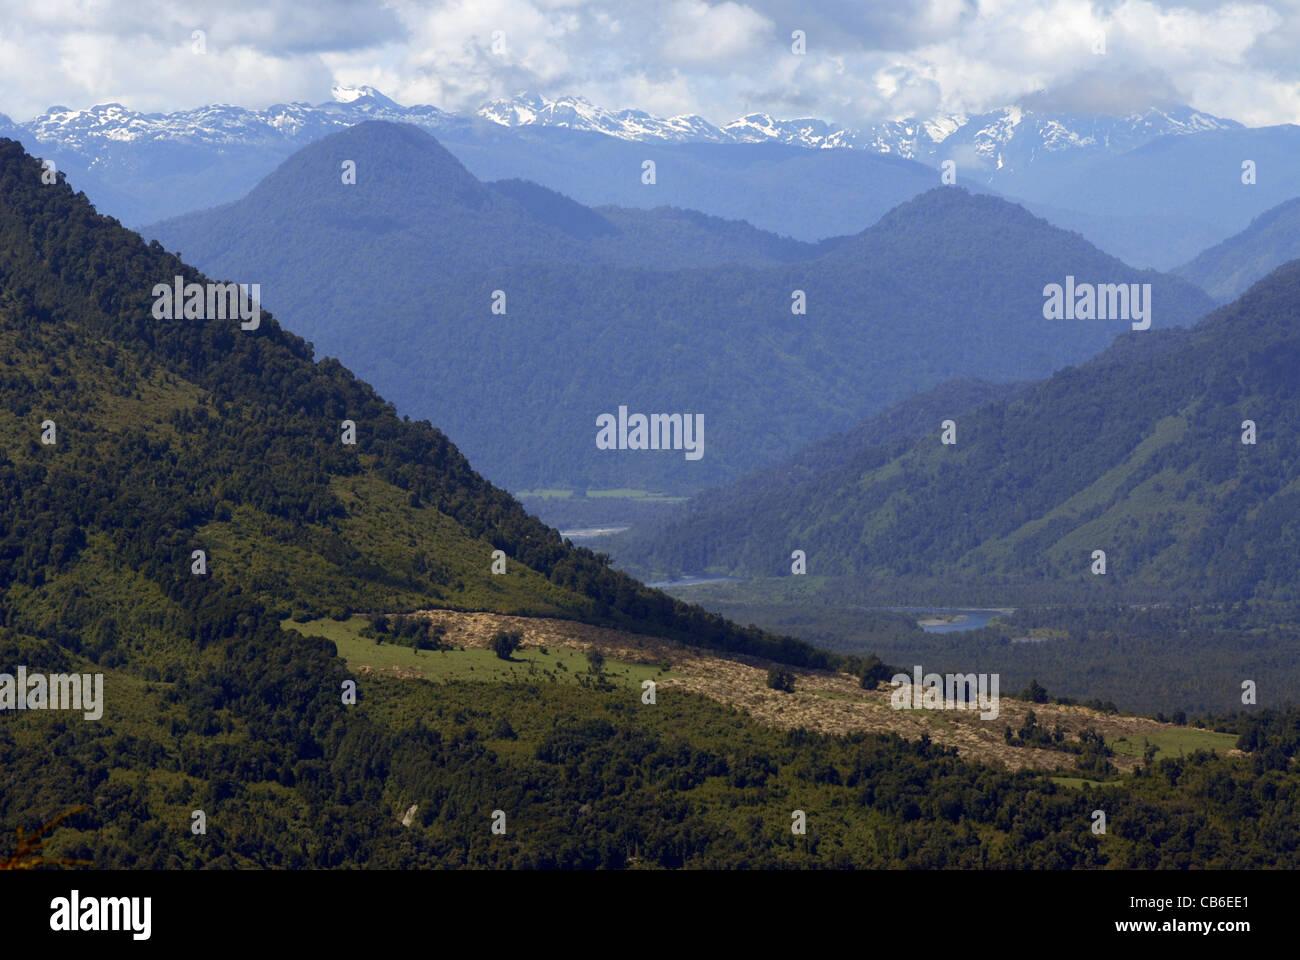 Nationalpark Vicente Perez Rosales, Lake District, Chile Stockbild